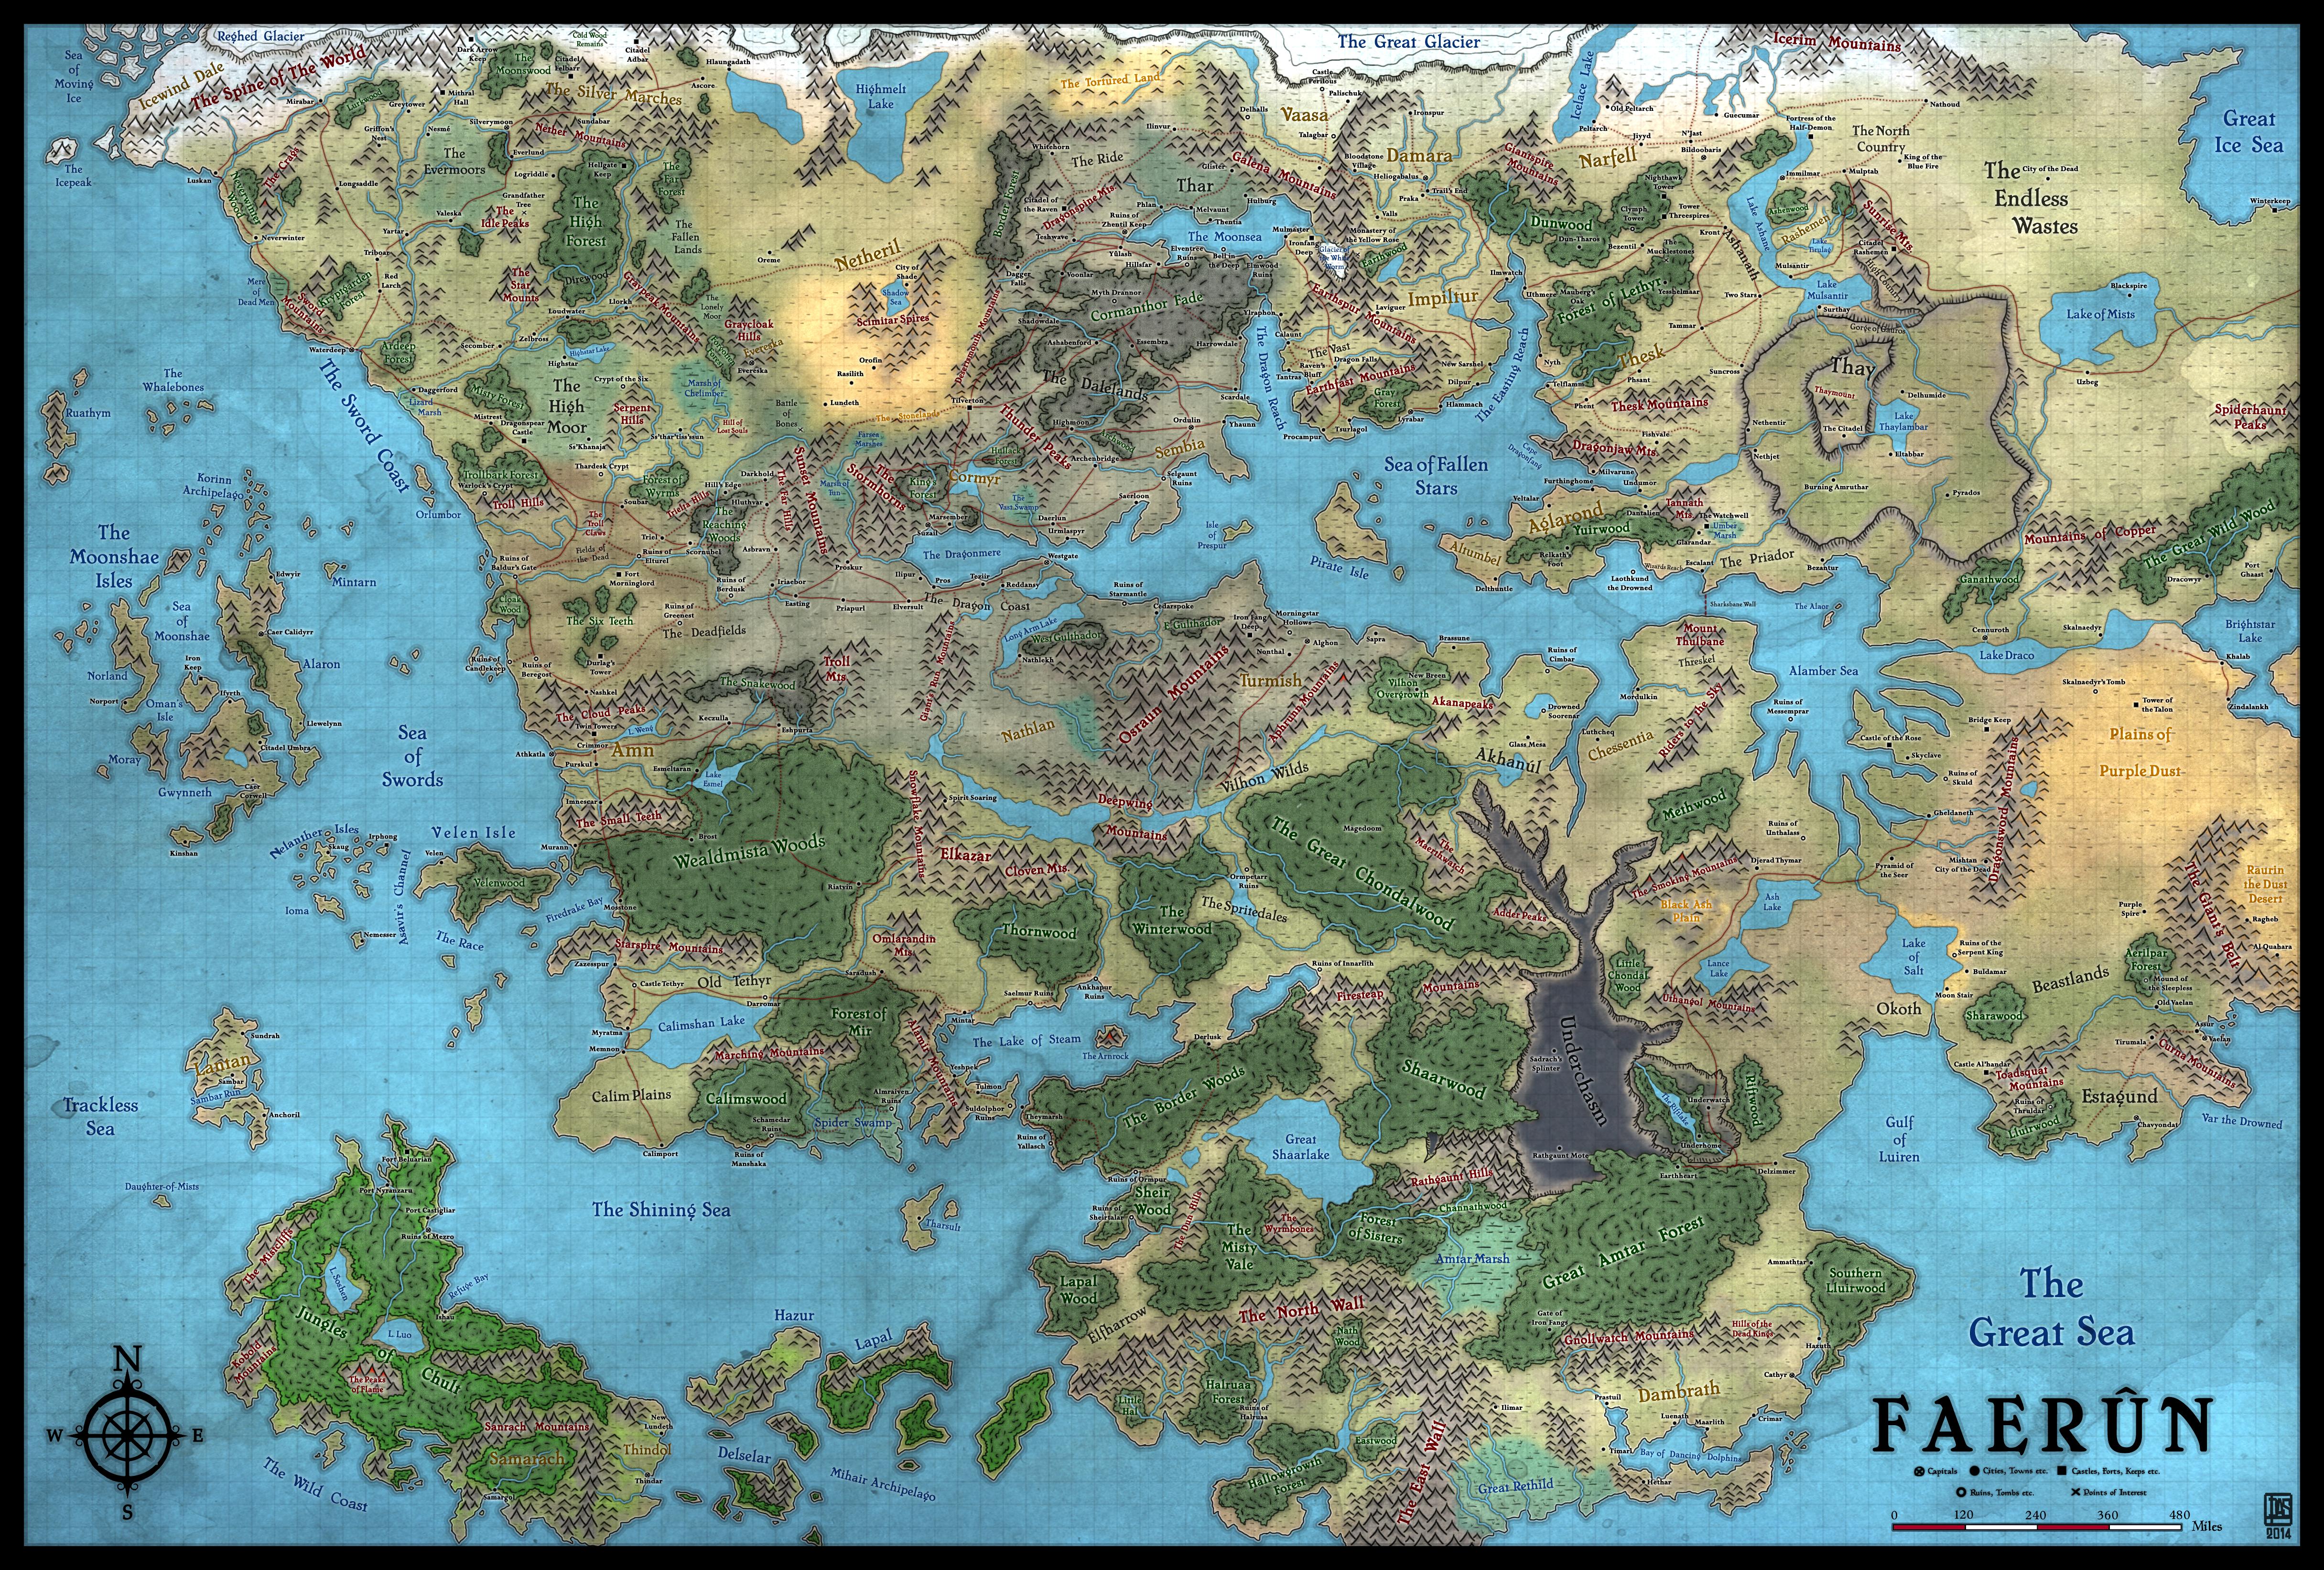 Levodoom's Faerun (1499 DR) in Forgotten Realms: Moonfall